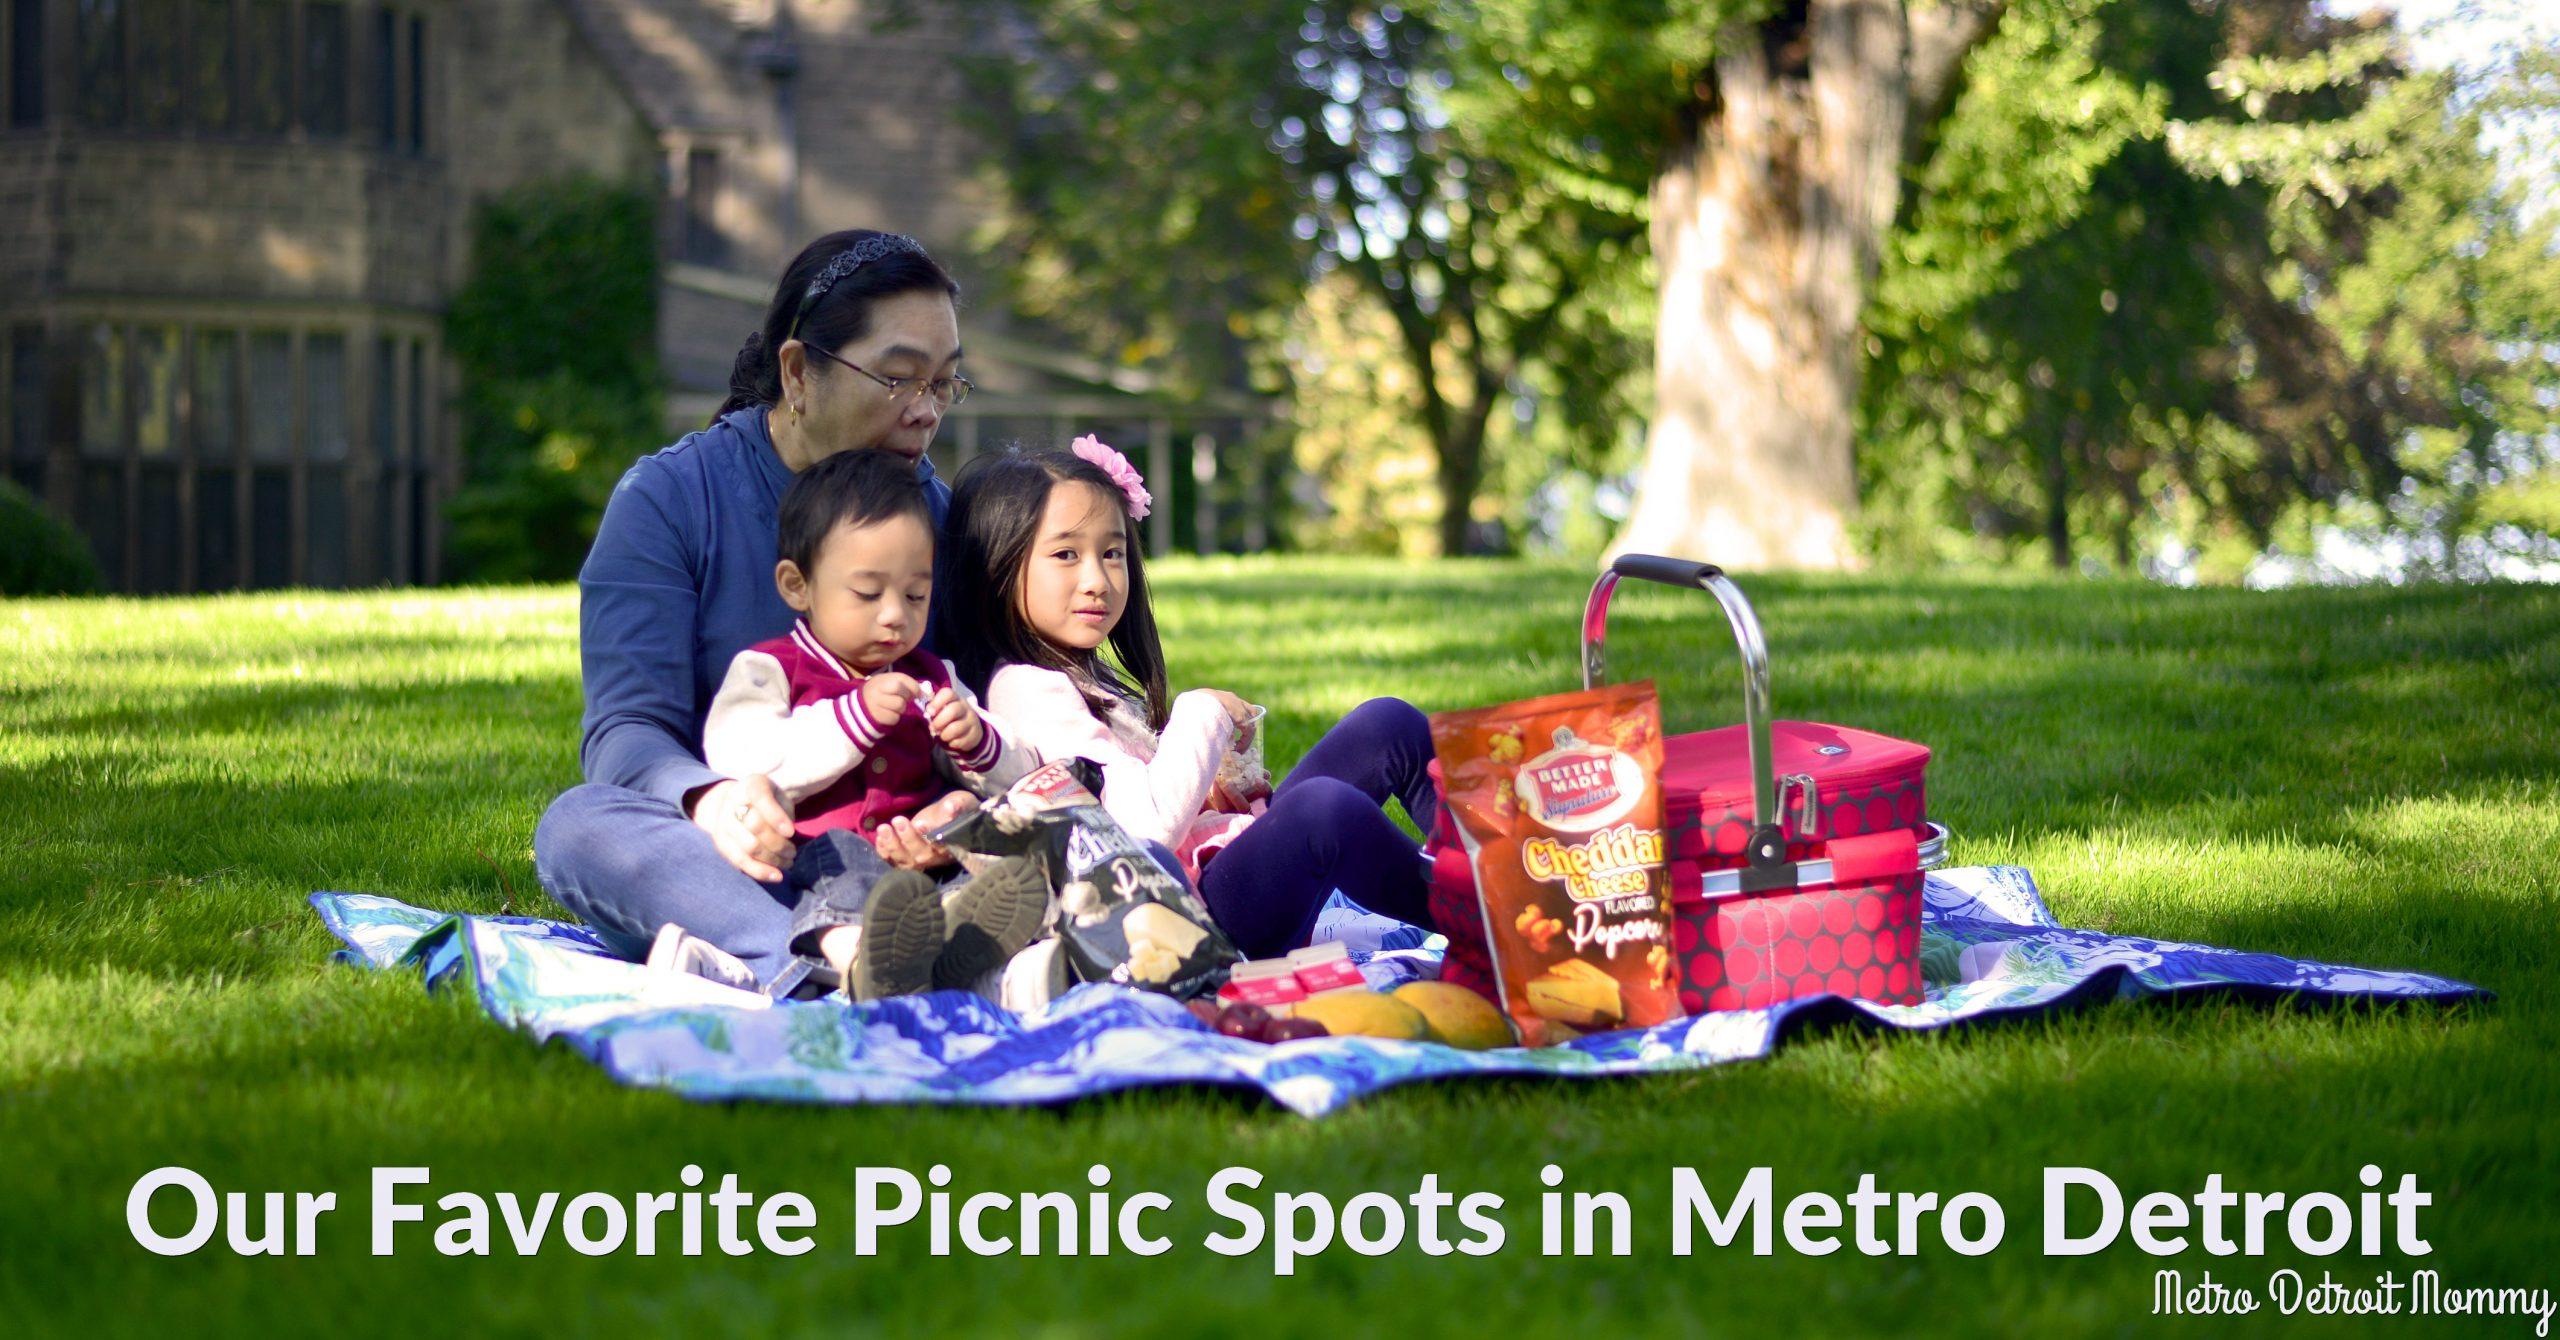 Twenty Great Metro Detroit Picnic Spots